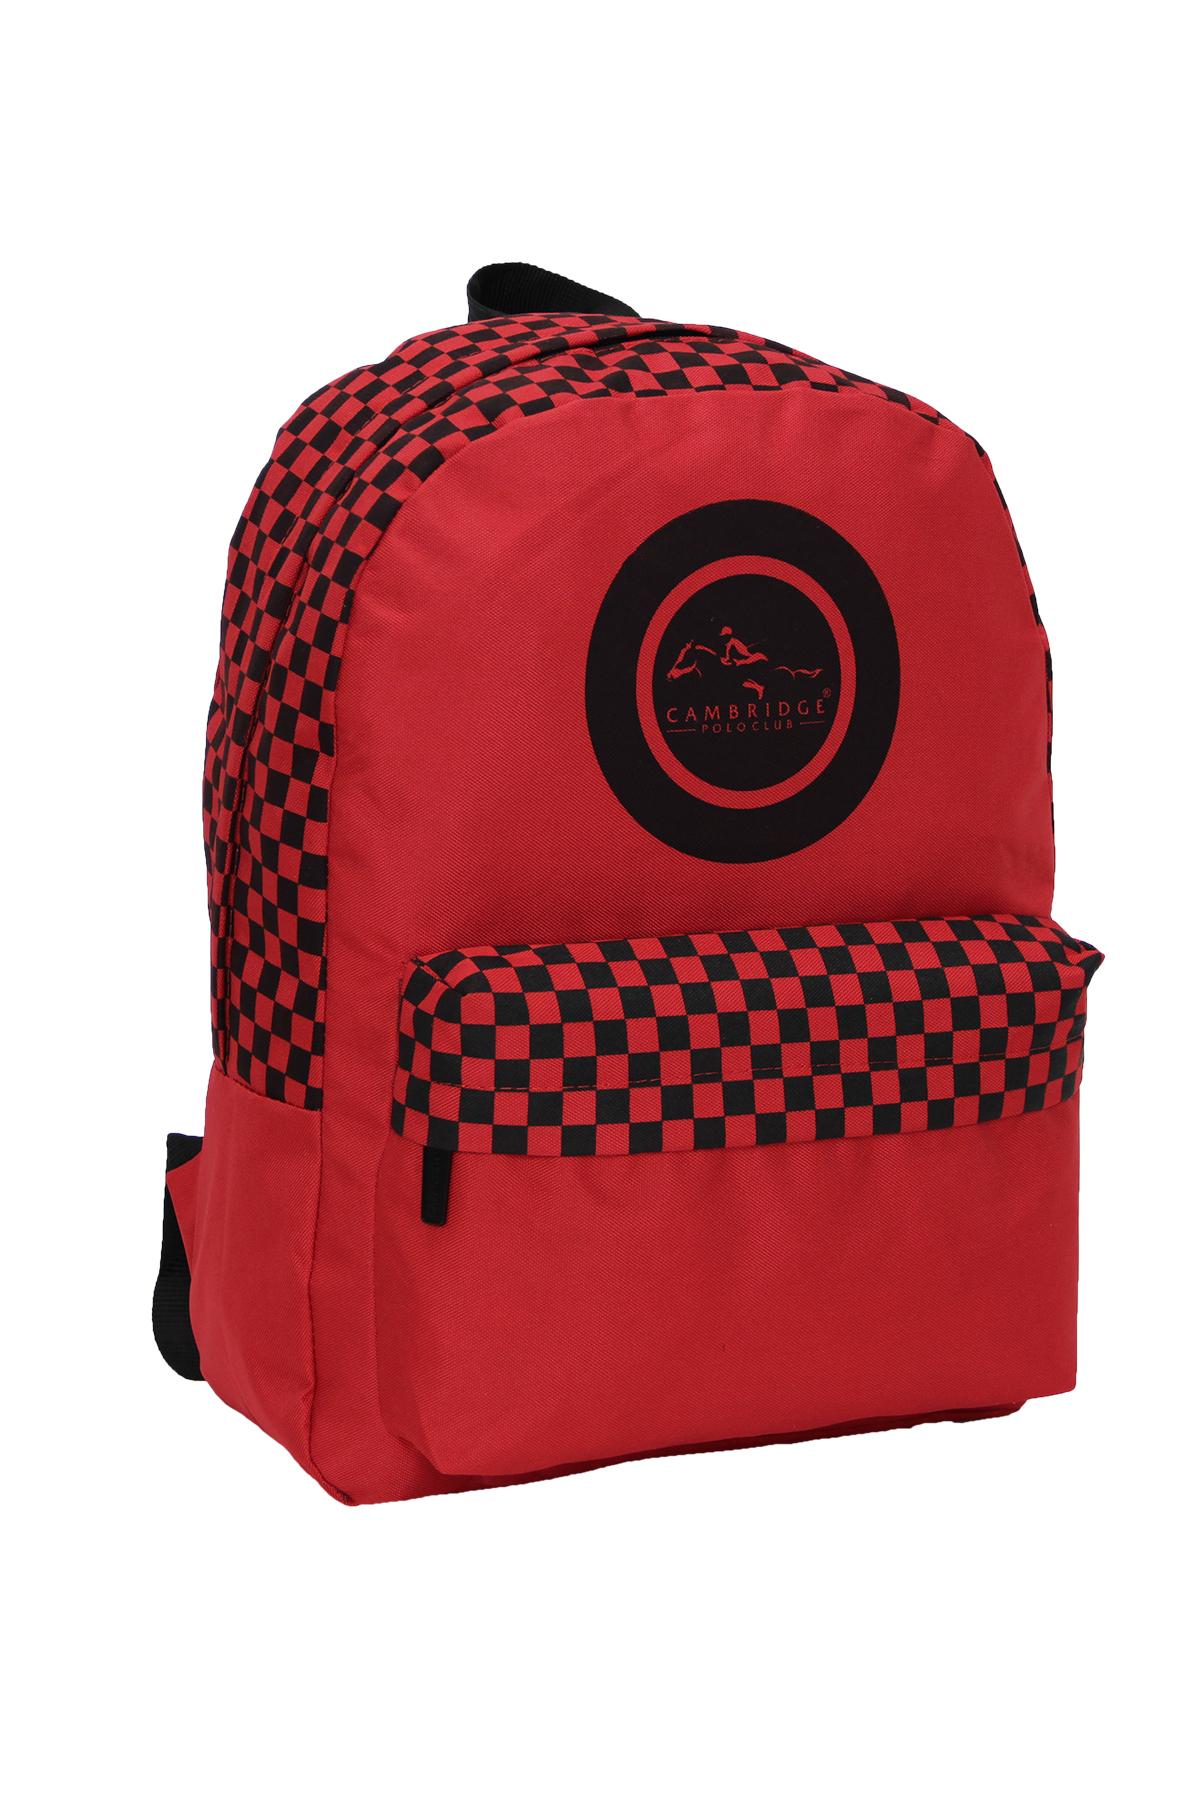 Cambridge Polo Club Multicolored School Backpacks 10